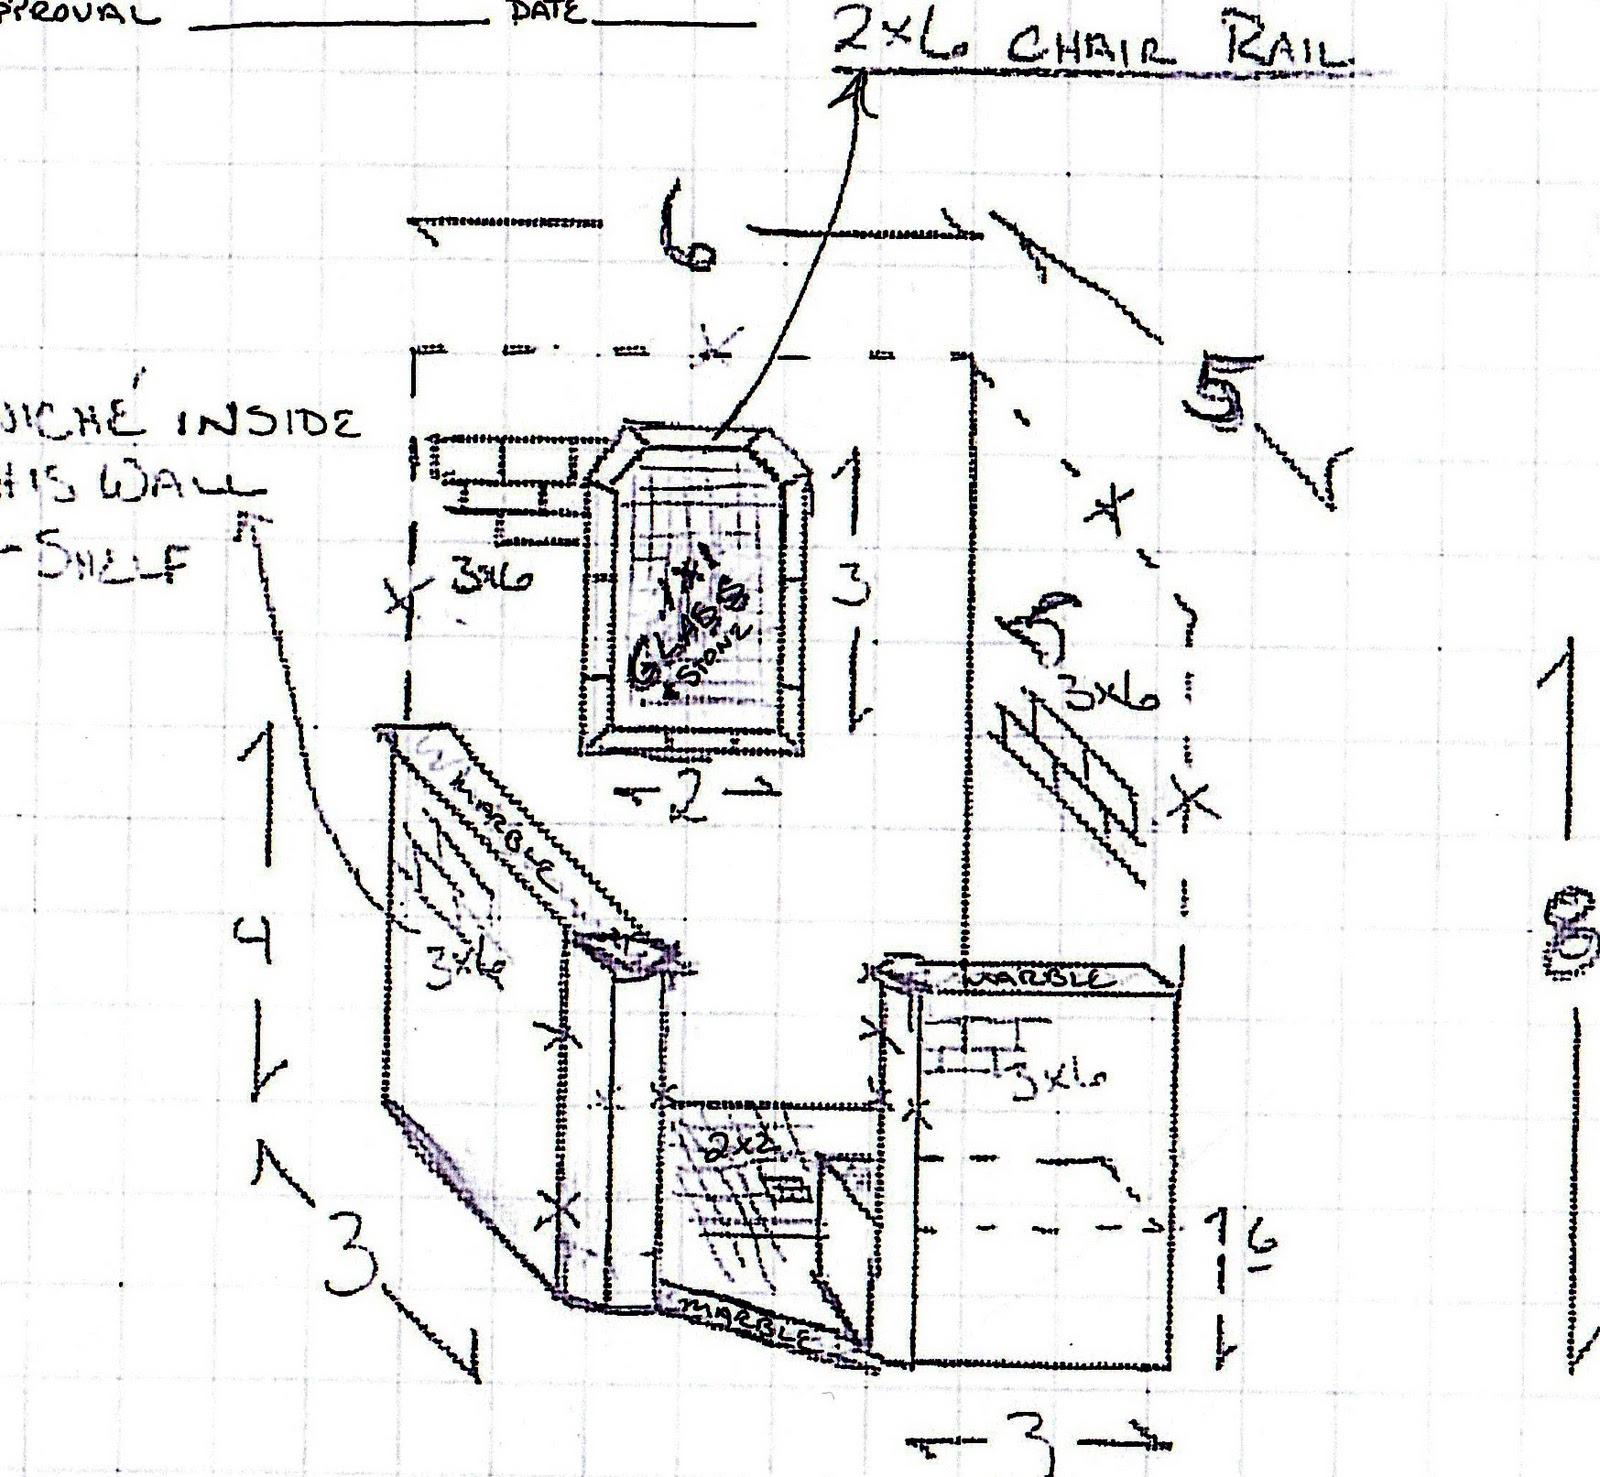 walk in shower dimensions bathroom floor plans with walk in shower